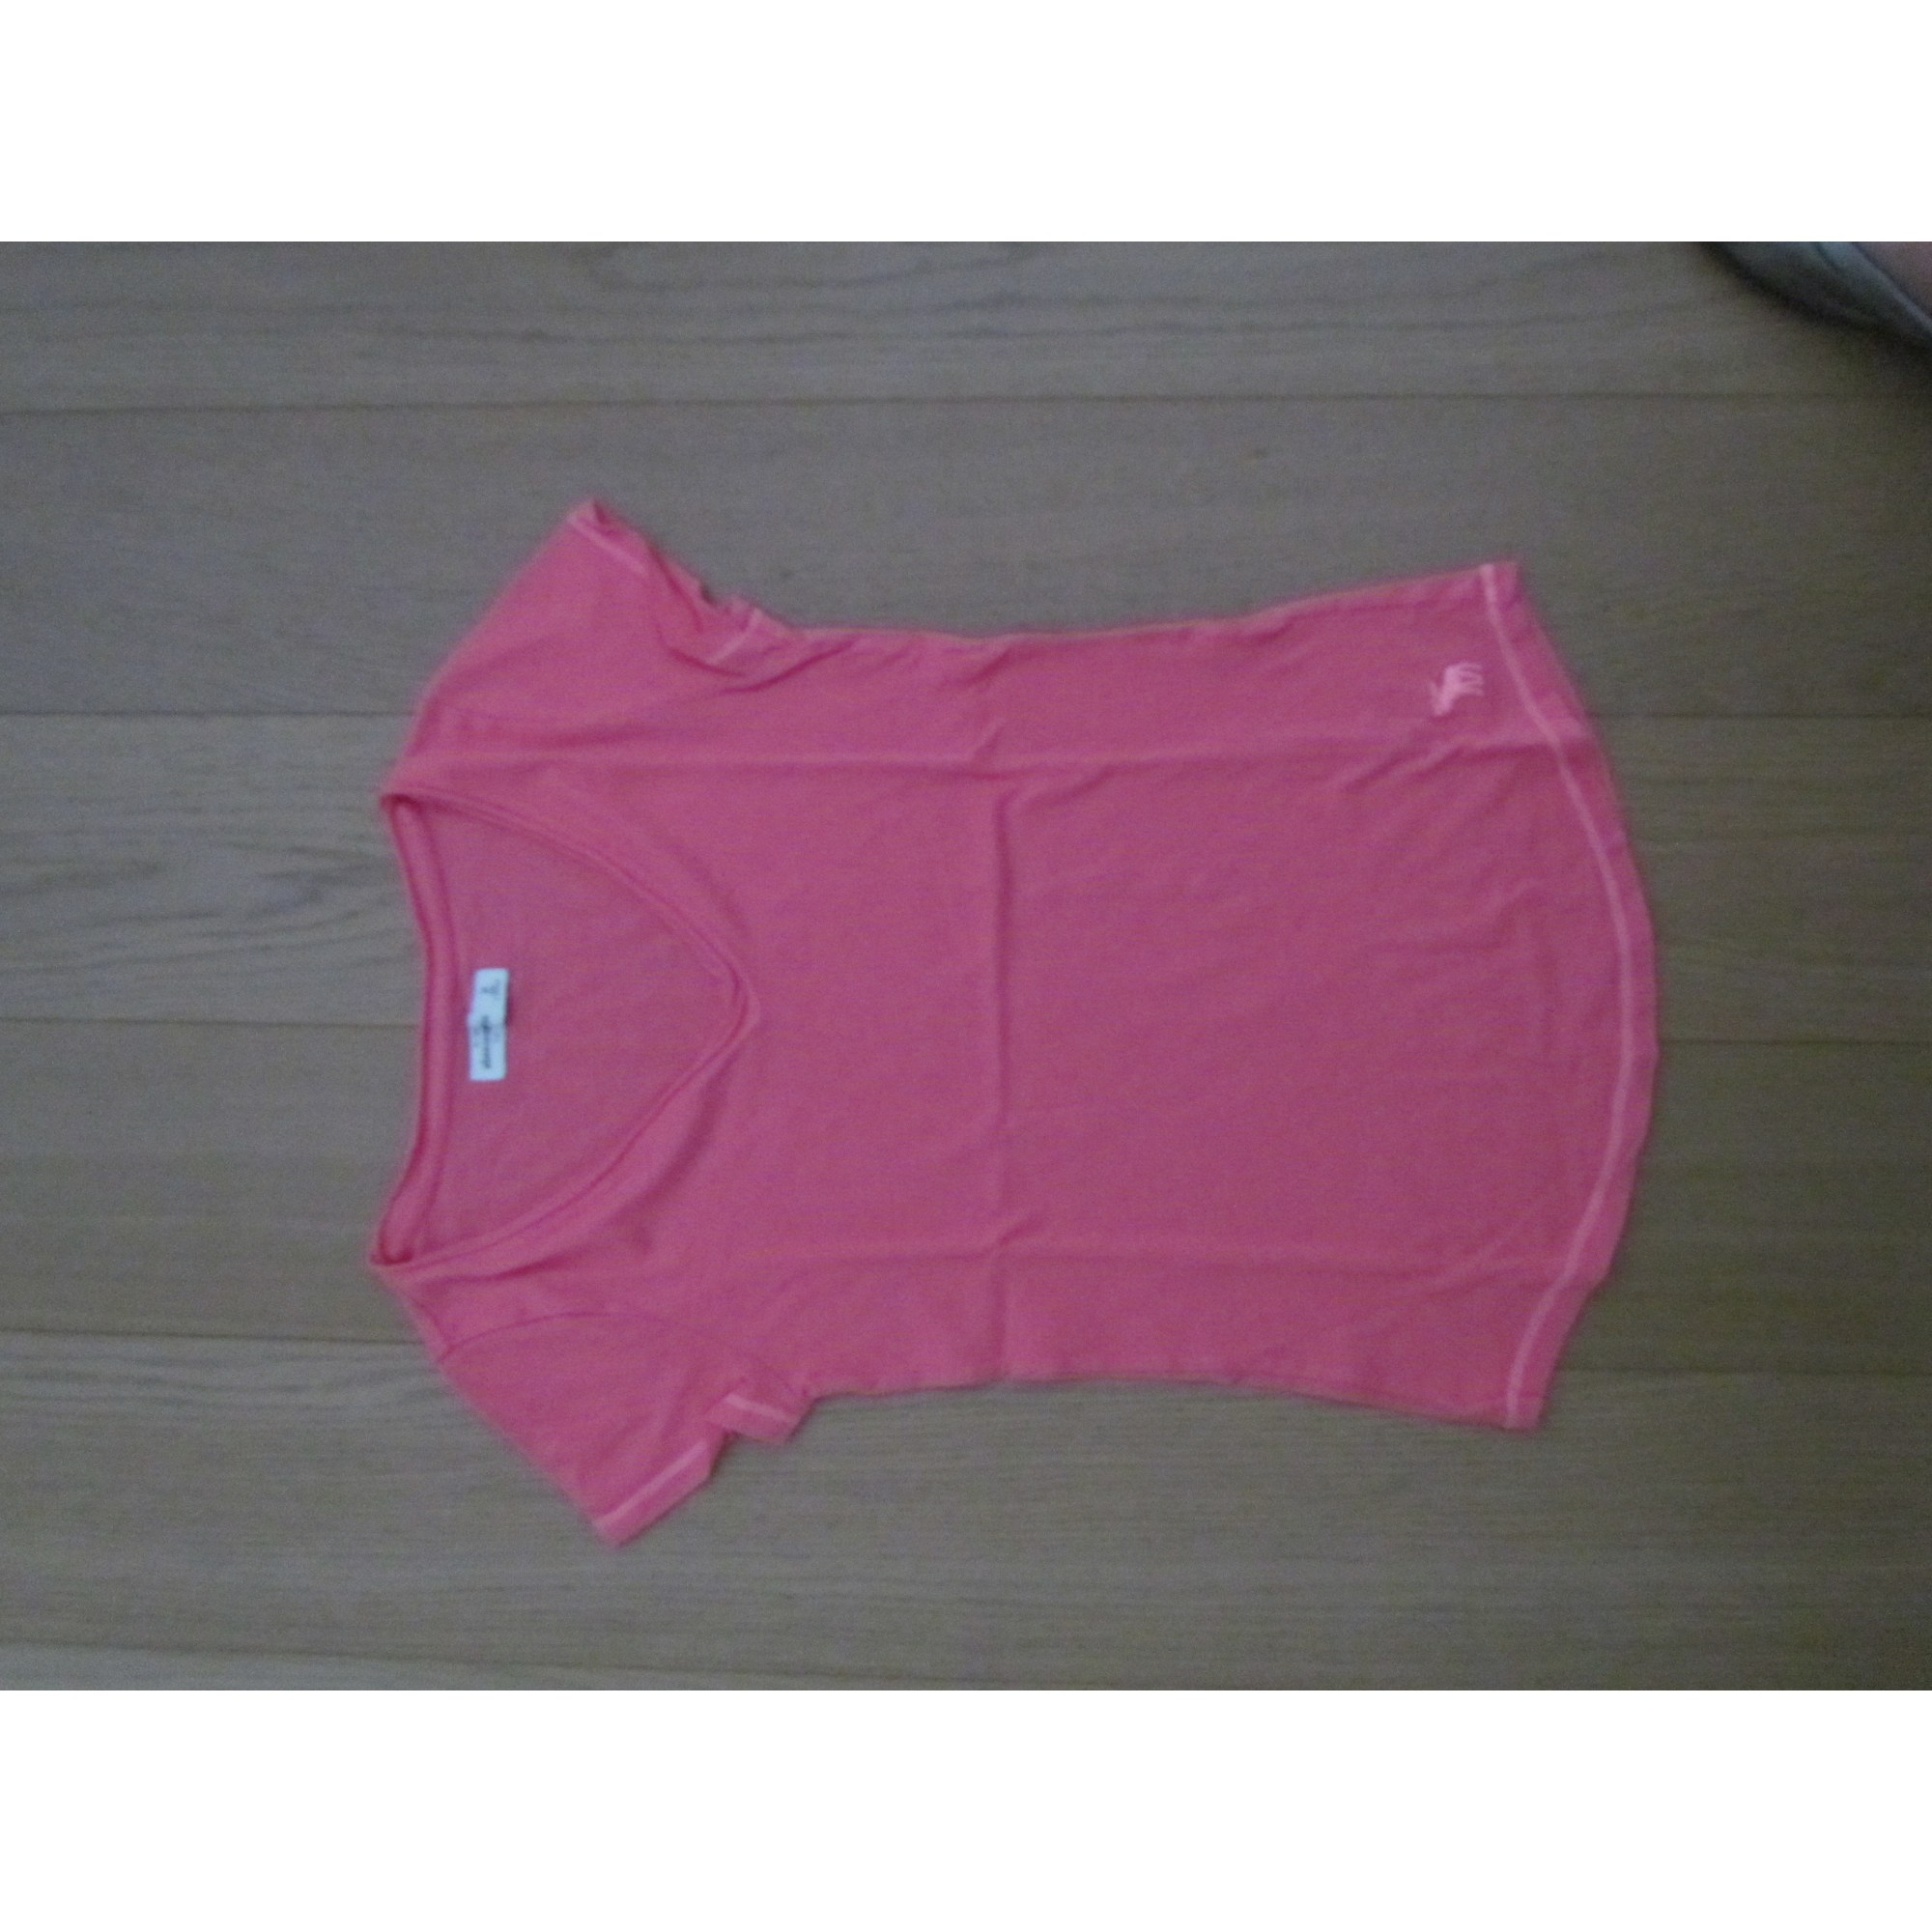 Top, Tee-shirt ABERCROMBIE & FITCH Rose, fuschia, vieux rose